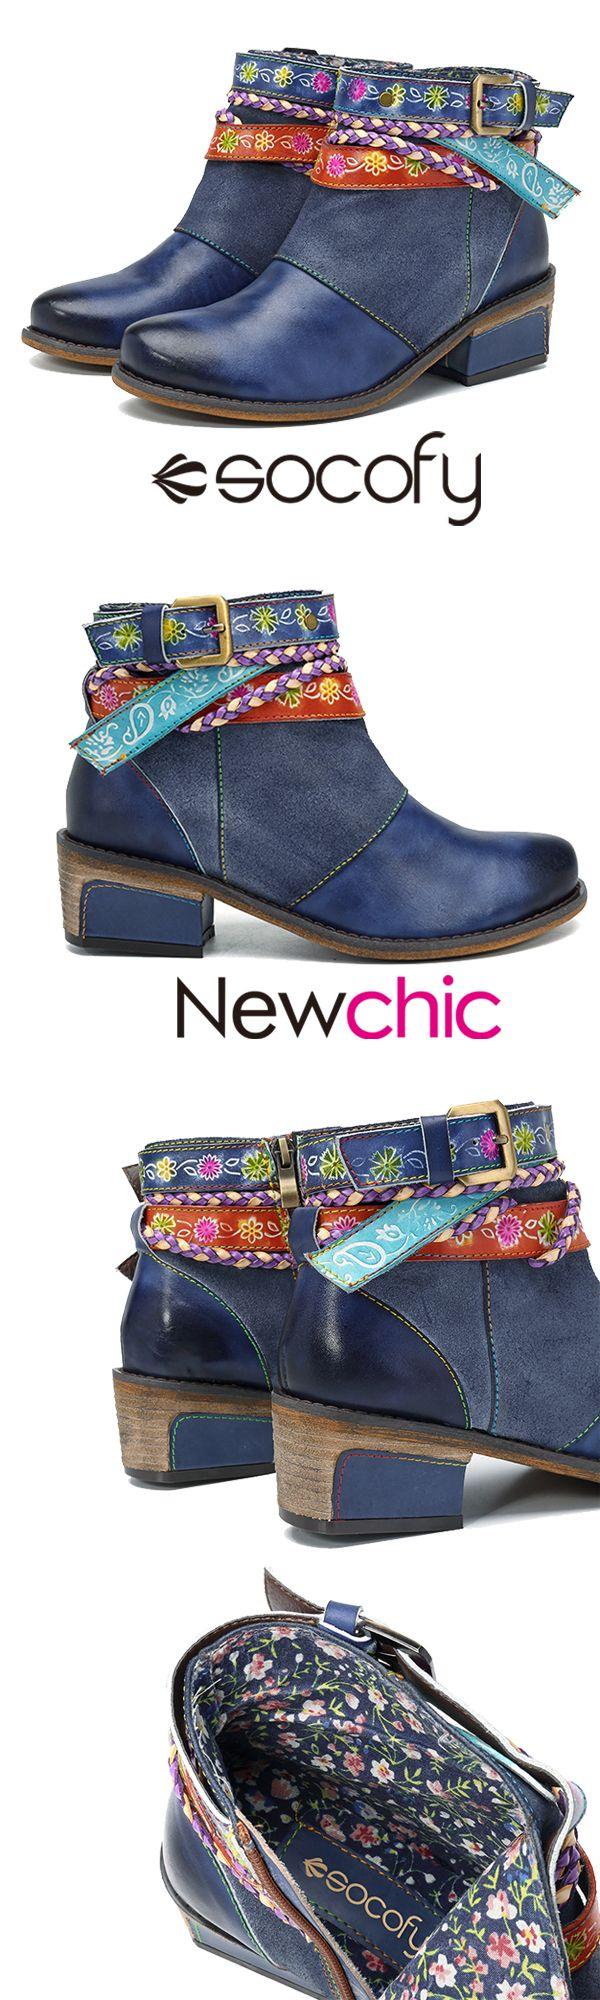 US$58.71 SOCOFY Friday Splicing Handmade Weaving Strap Ankle Leather Boots #GiftForHer #WinterBootsWomen